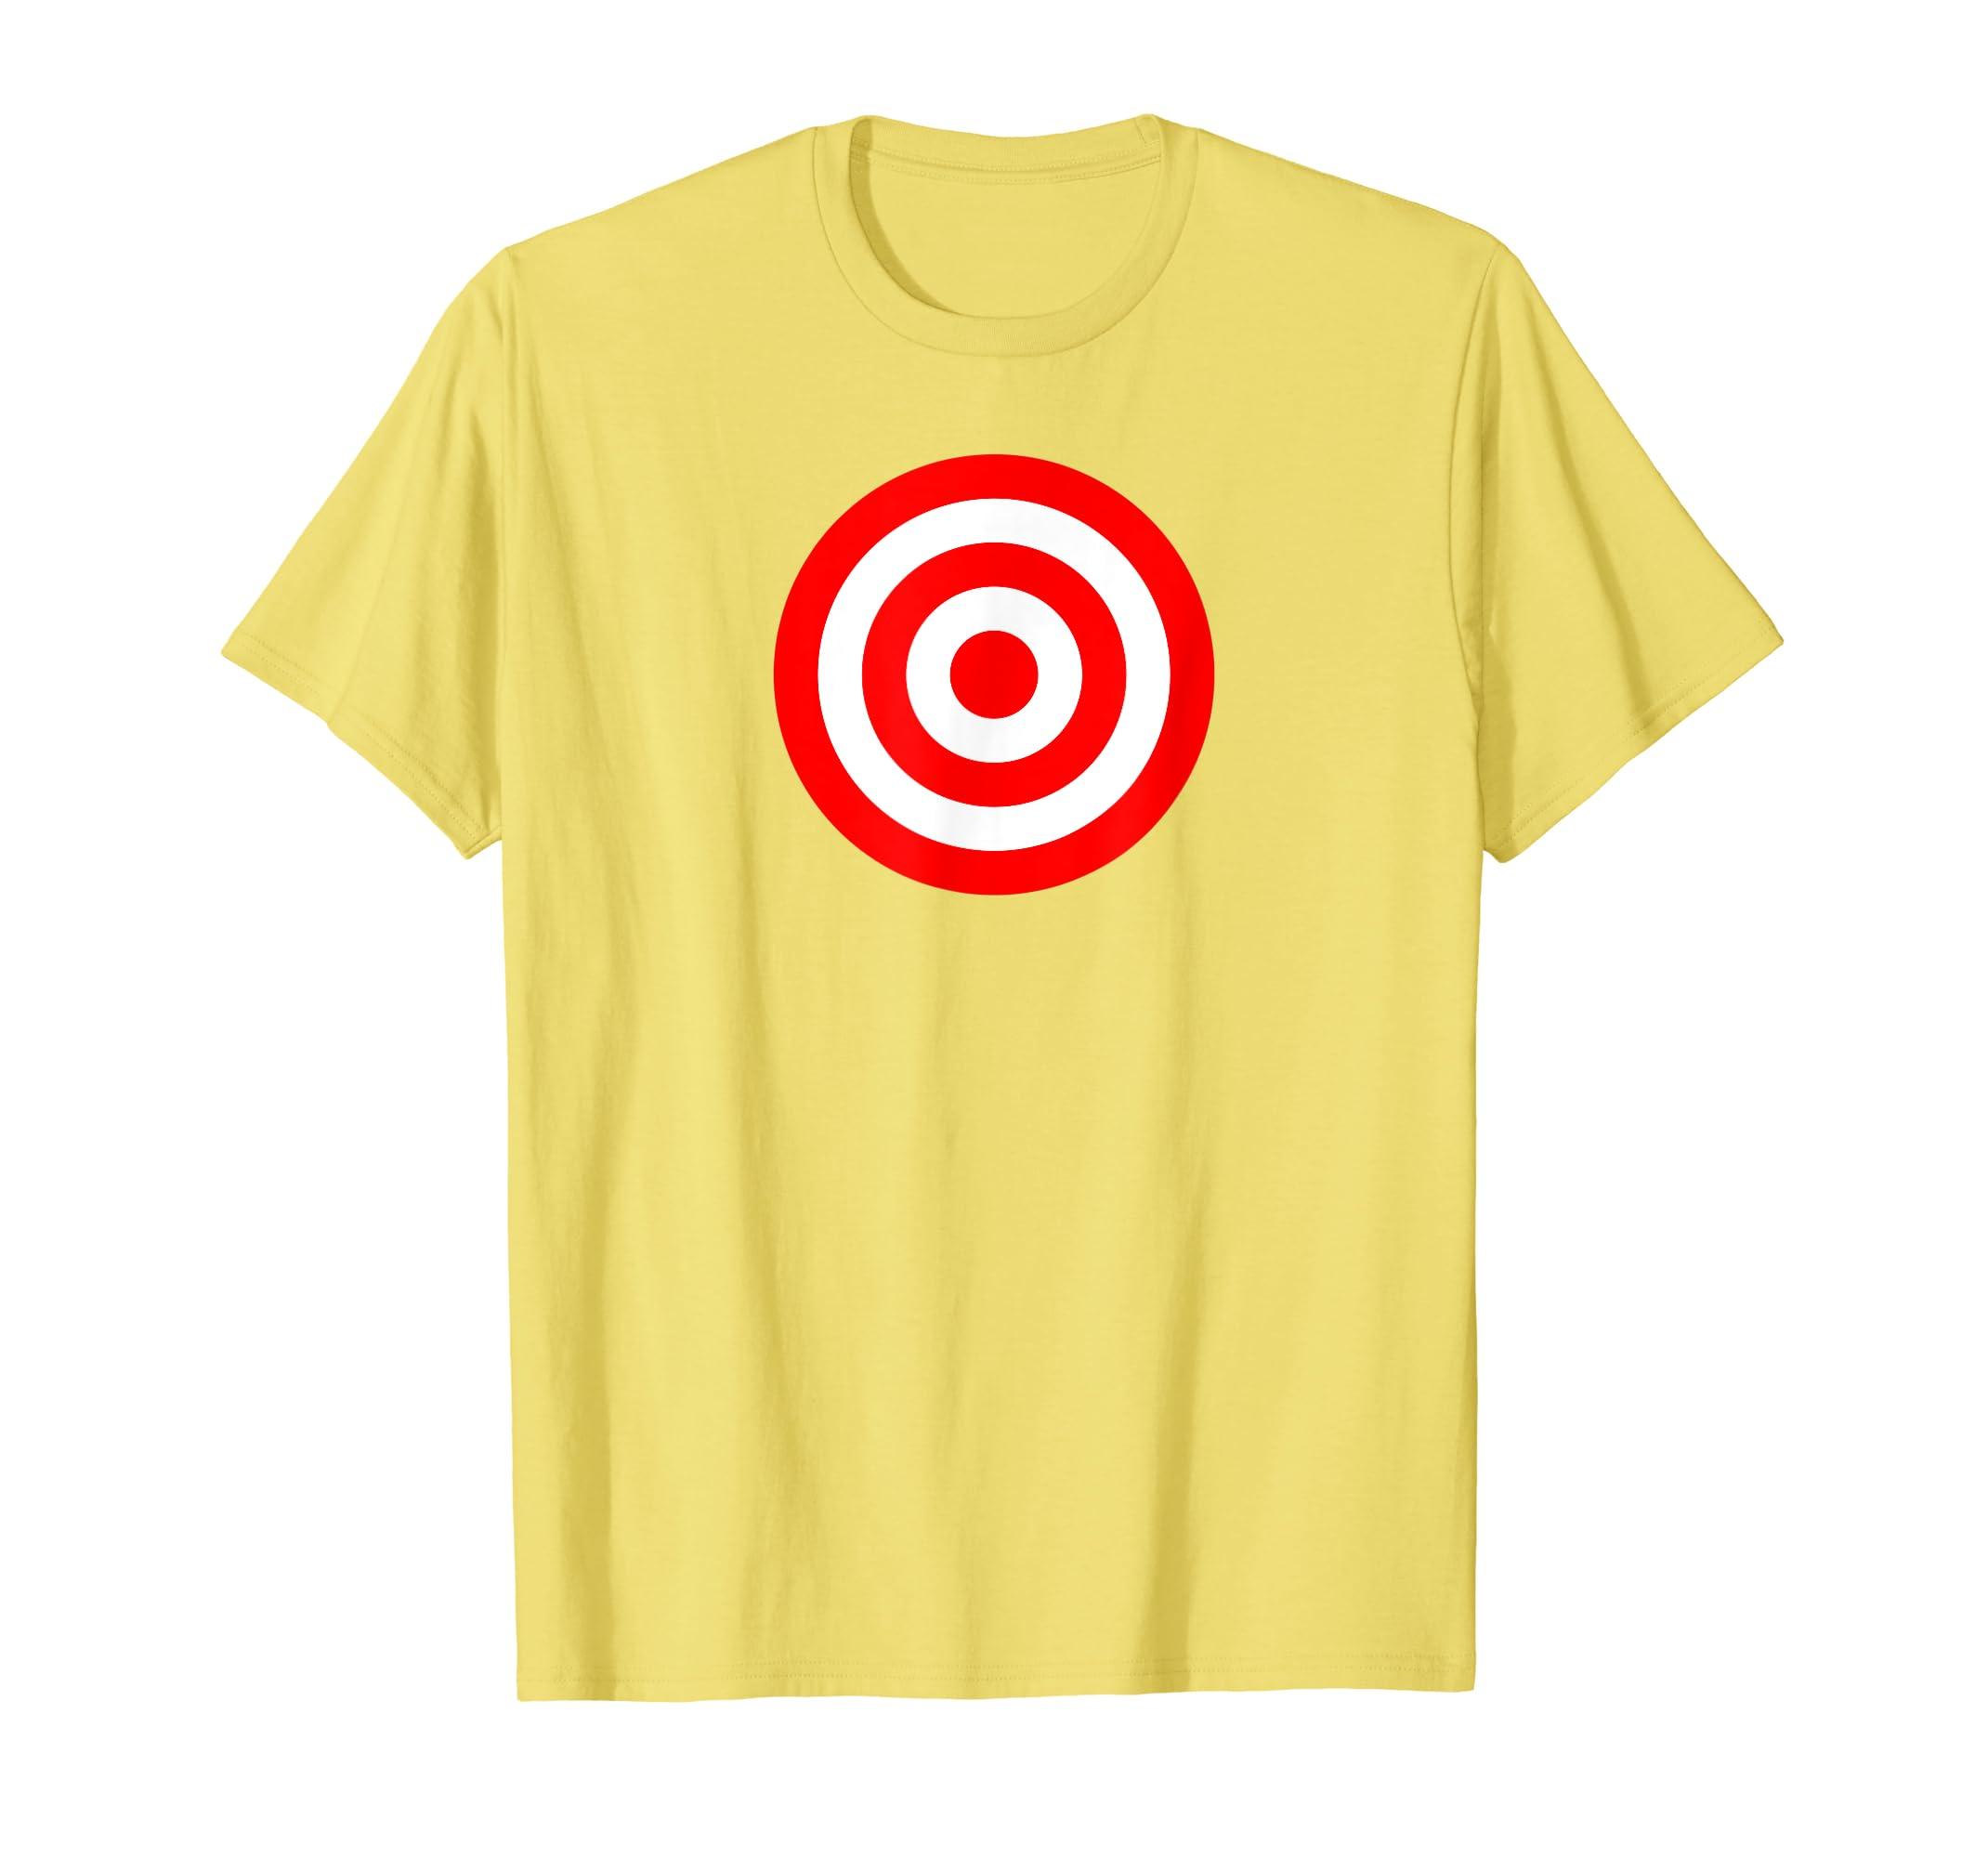 06aeaf9276 Bullseye Red & White Shooting Rings Target Funny Tee Shirt ...